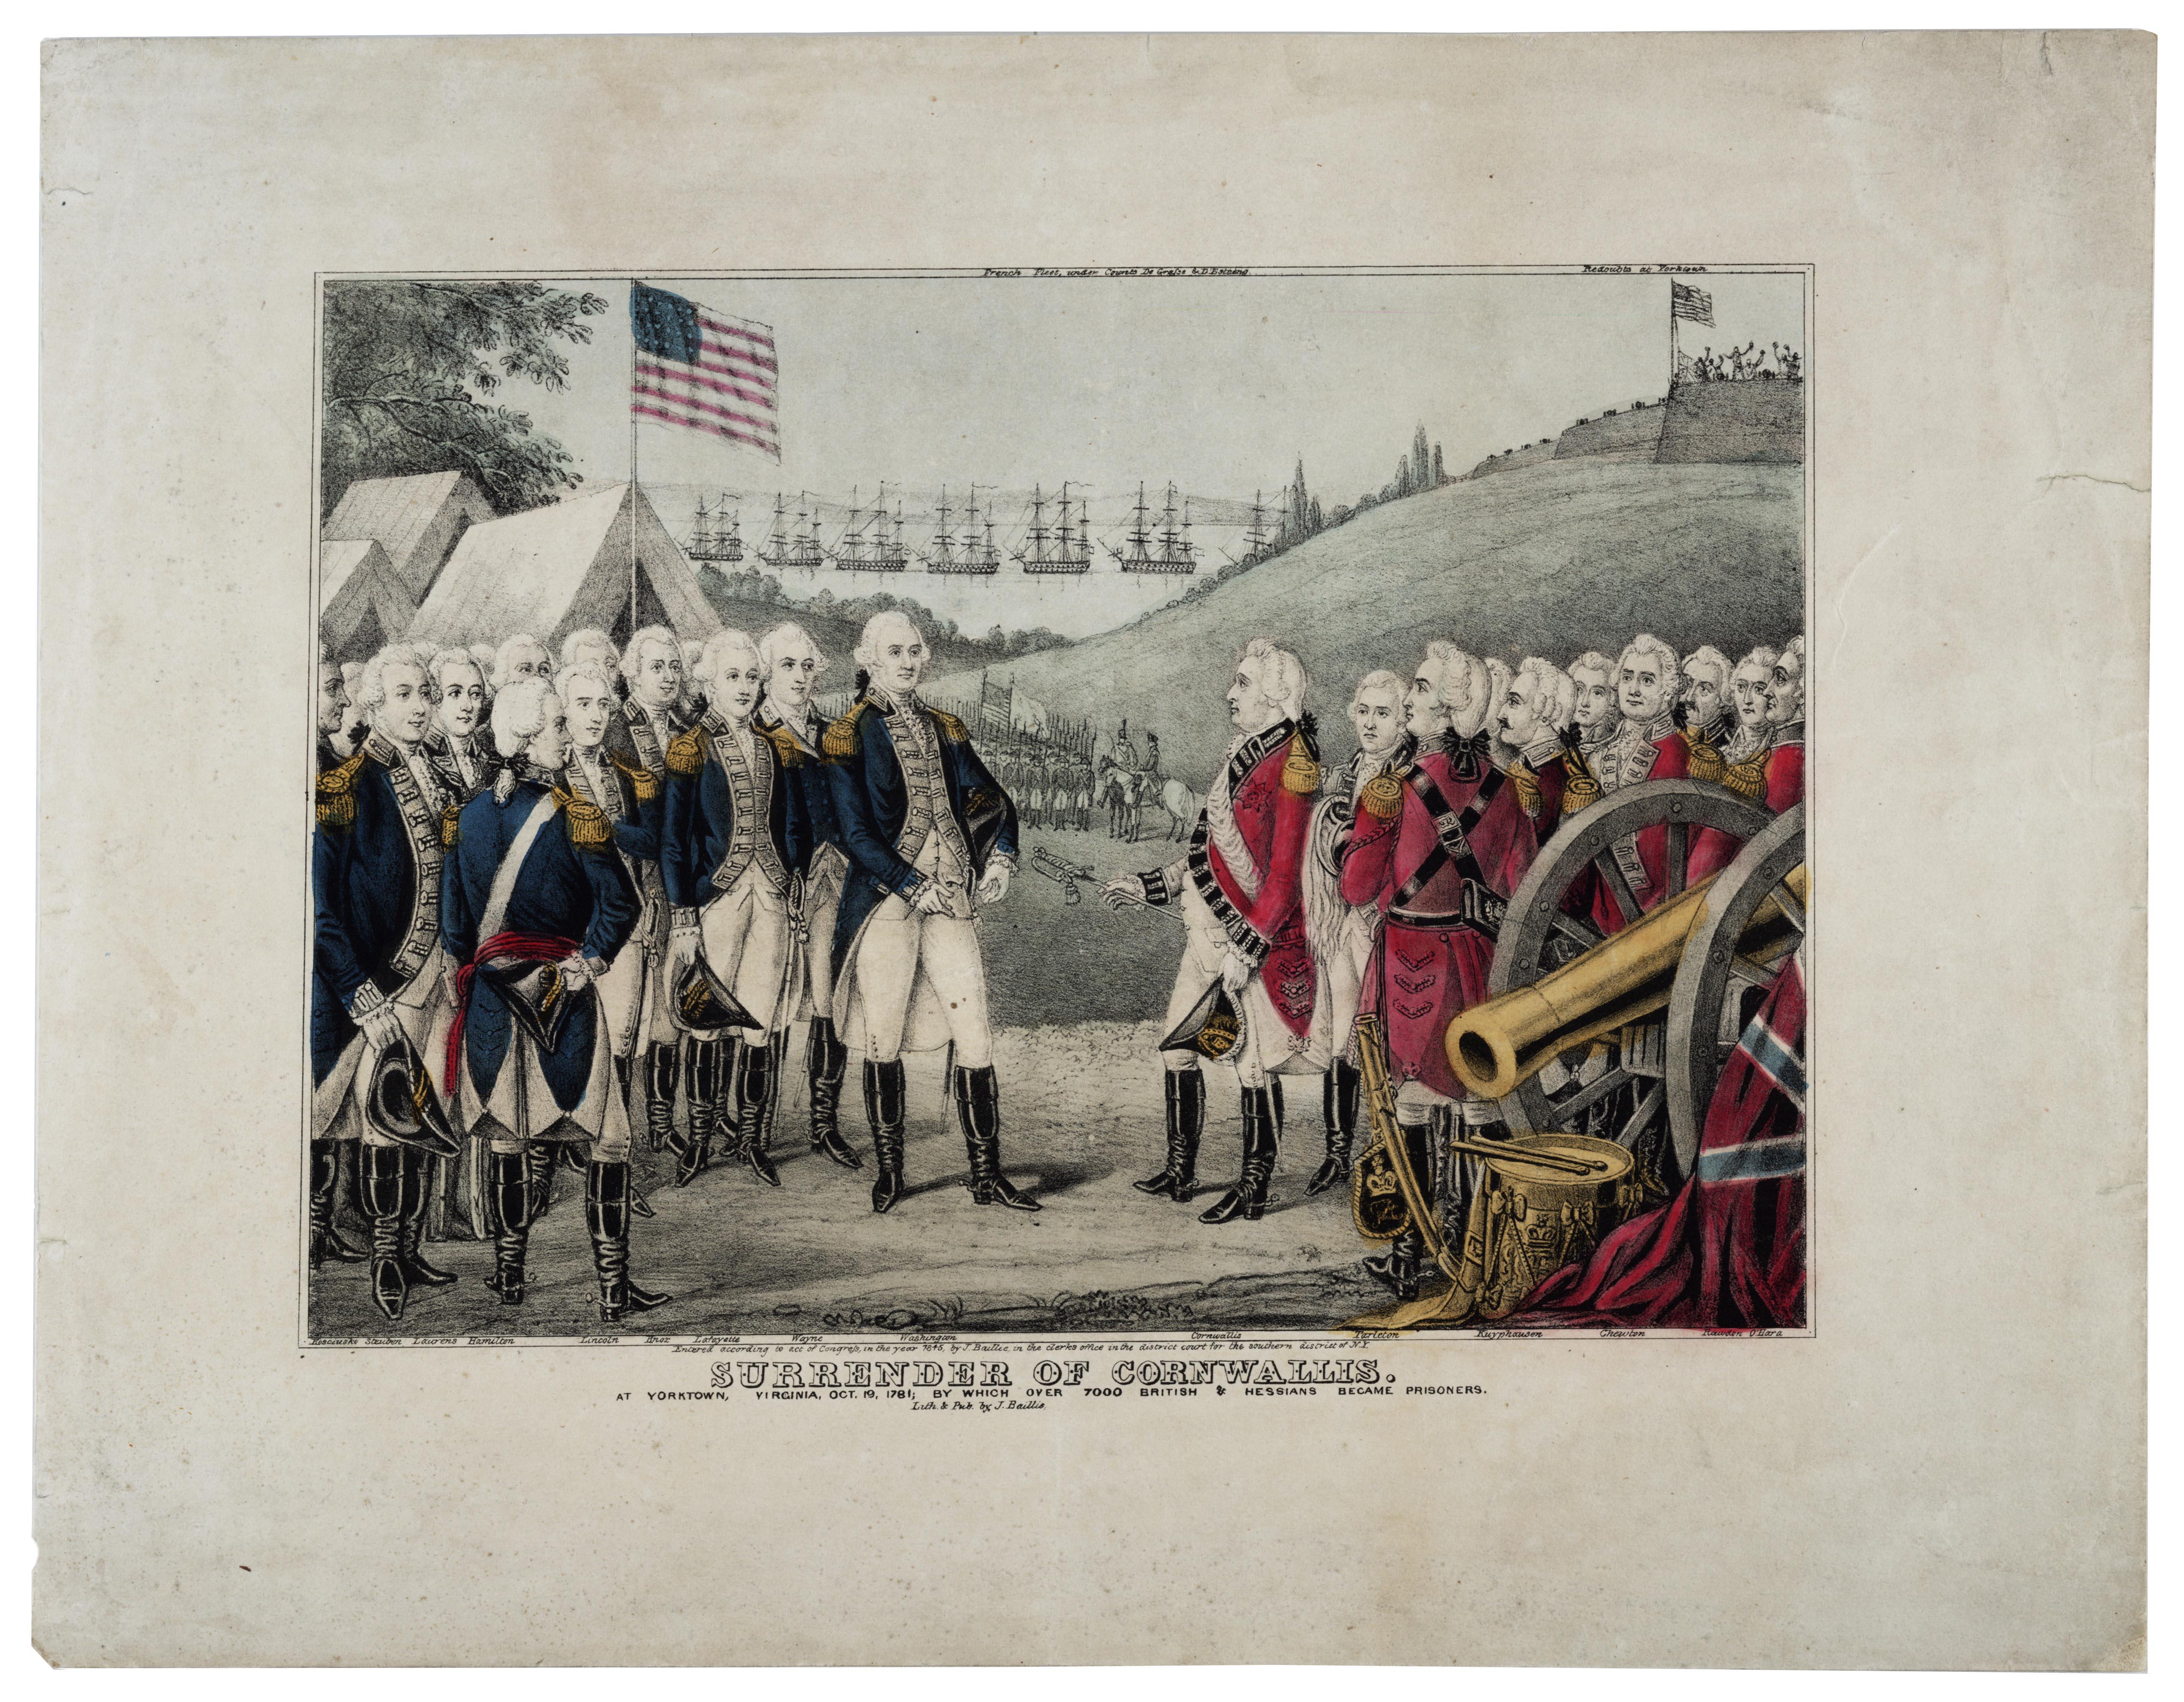 Surrender of Cornwallis, print by James S. Baillie, 1845 (Gilder Lehrman Col